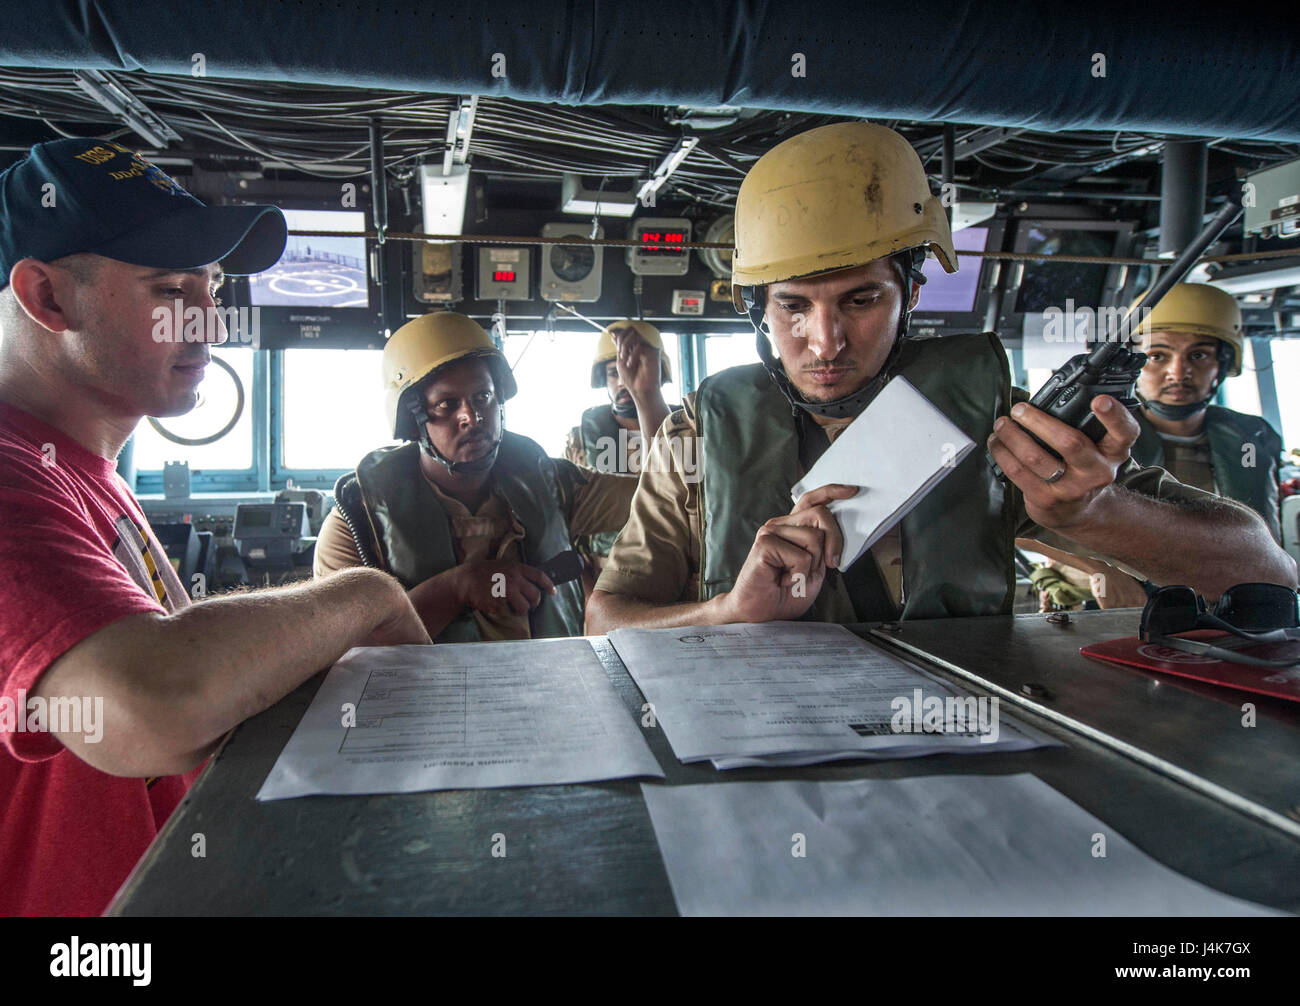 ARABIAN GULF (May 3, 2017) Royal Saudi Navy Sailors participate in visit, board, search and seizure (VBSS) training - Stock Image